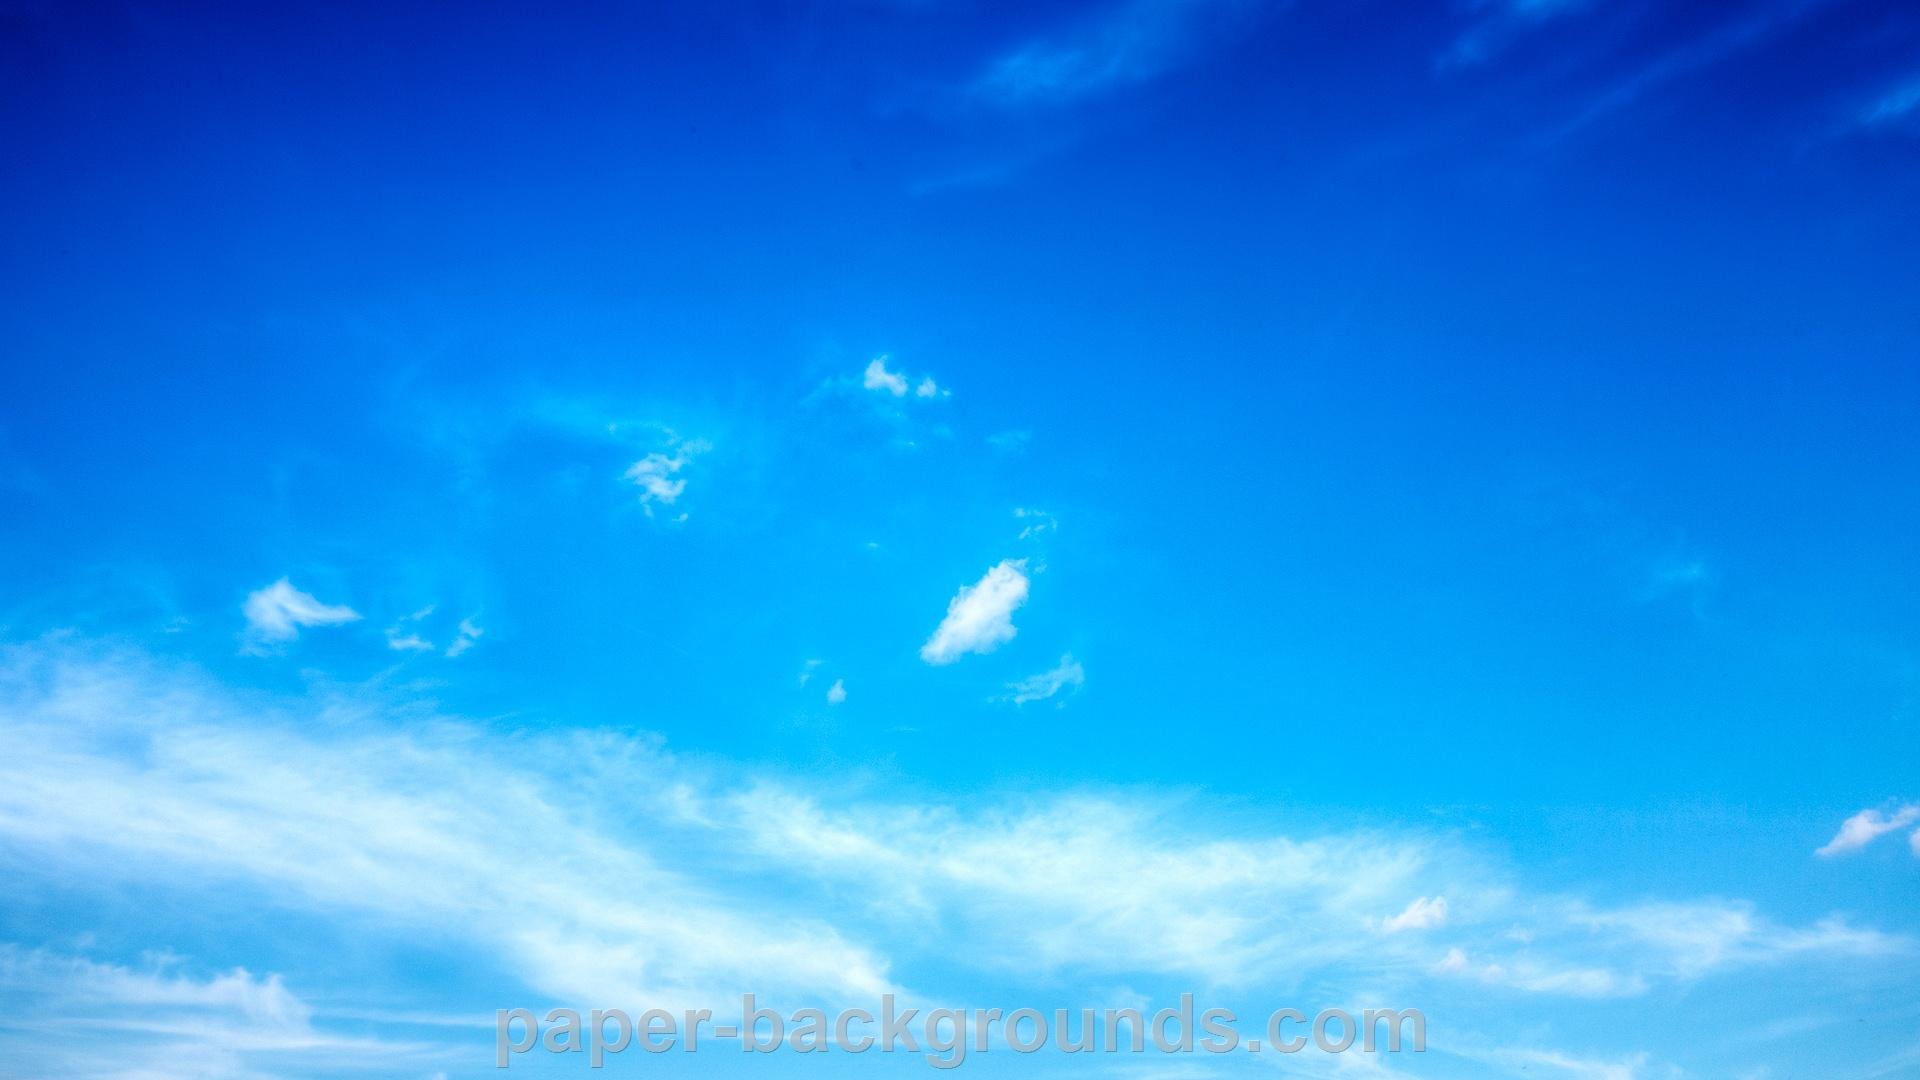 Blue Sky Background wallpaper 176918 1920x1080